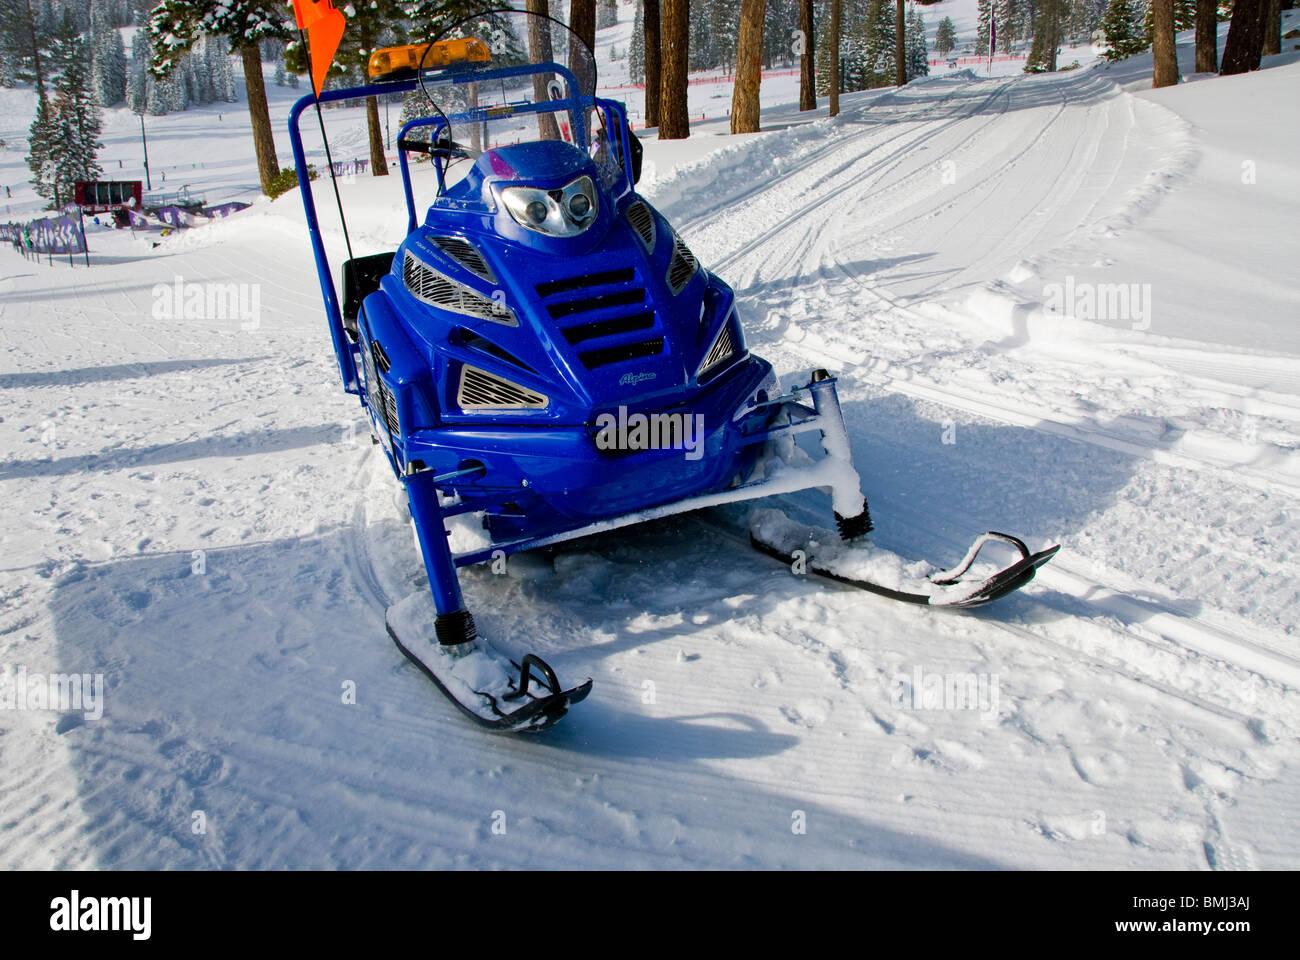 motorized snowmobile, Winter scene, North Lake Tahoe, California, USA Stock Photo